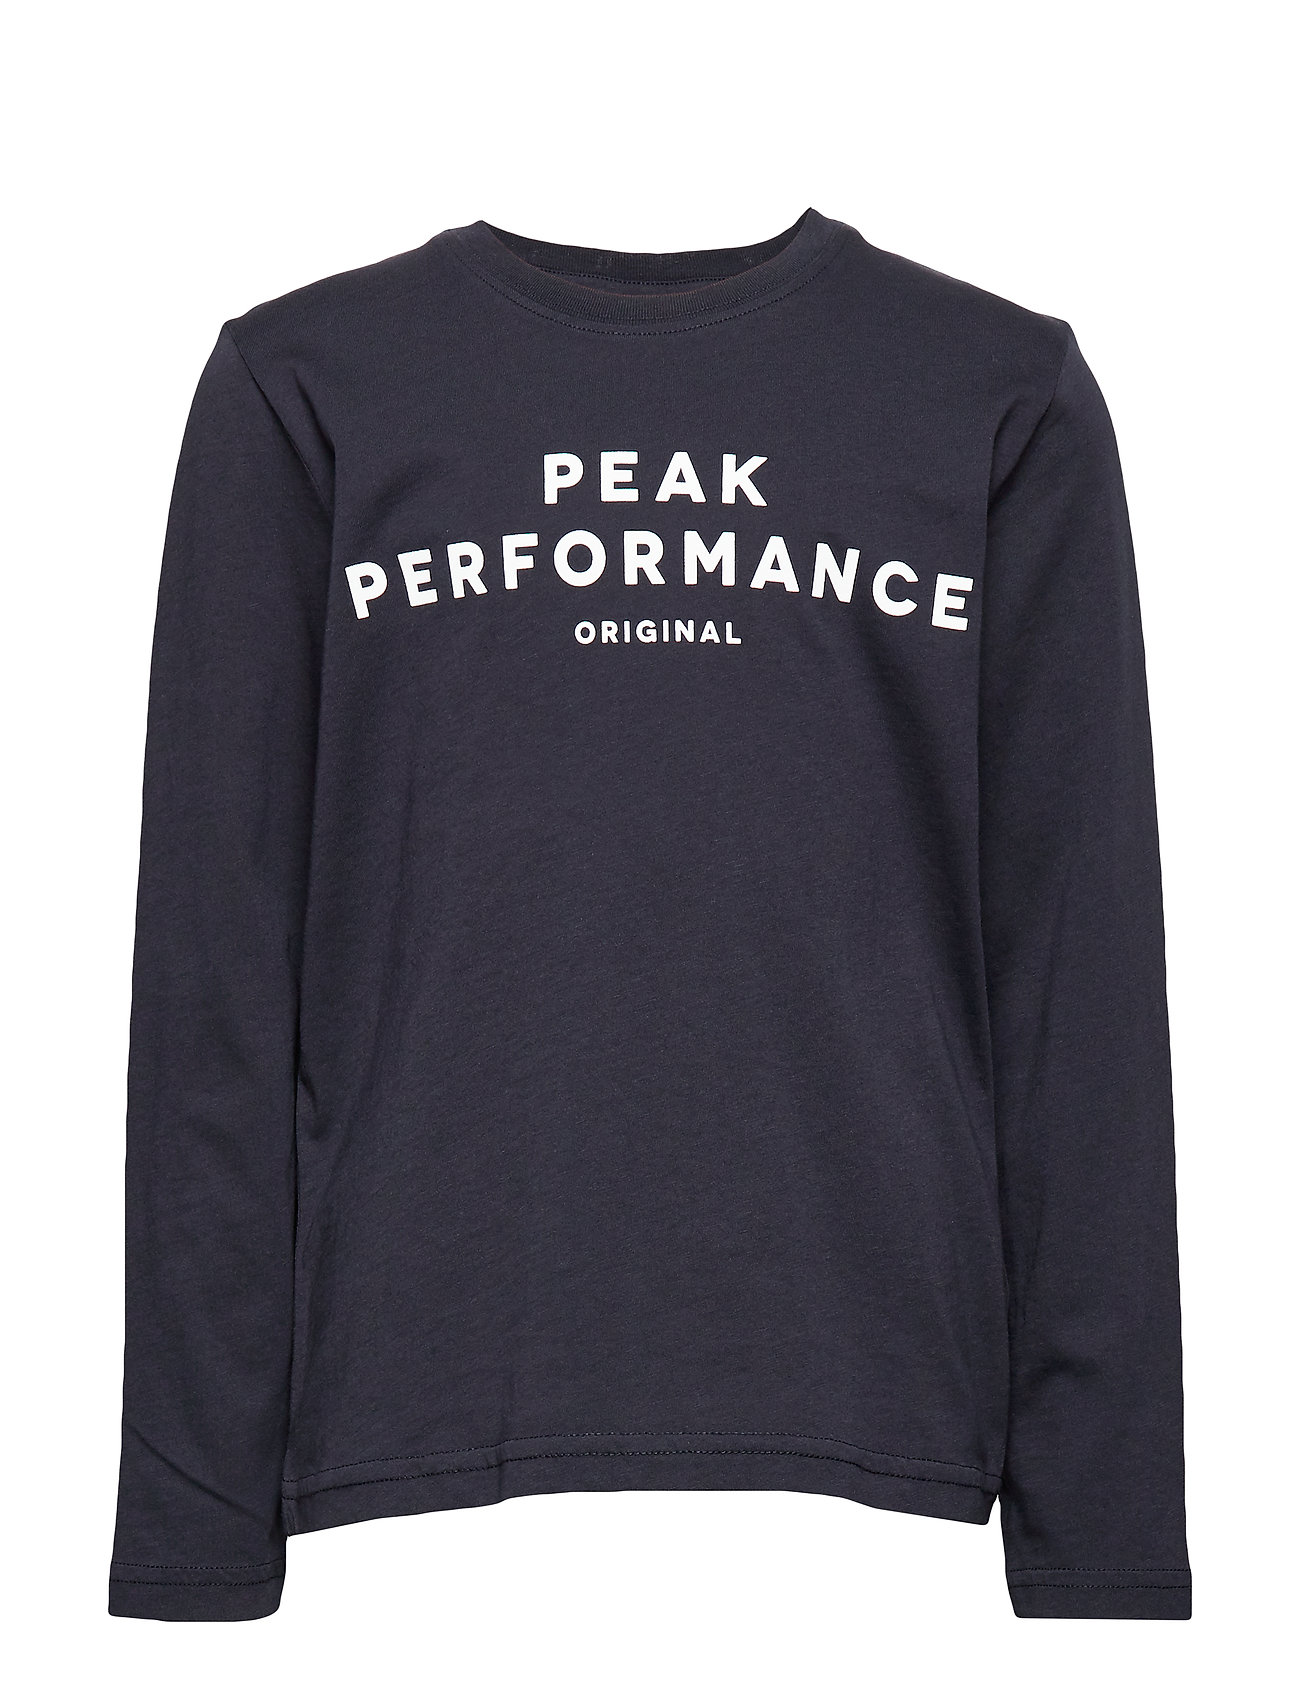 Peak Performance JR ORIG LS - SALUTE BLUE